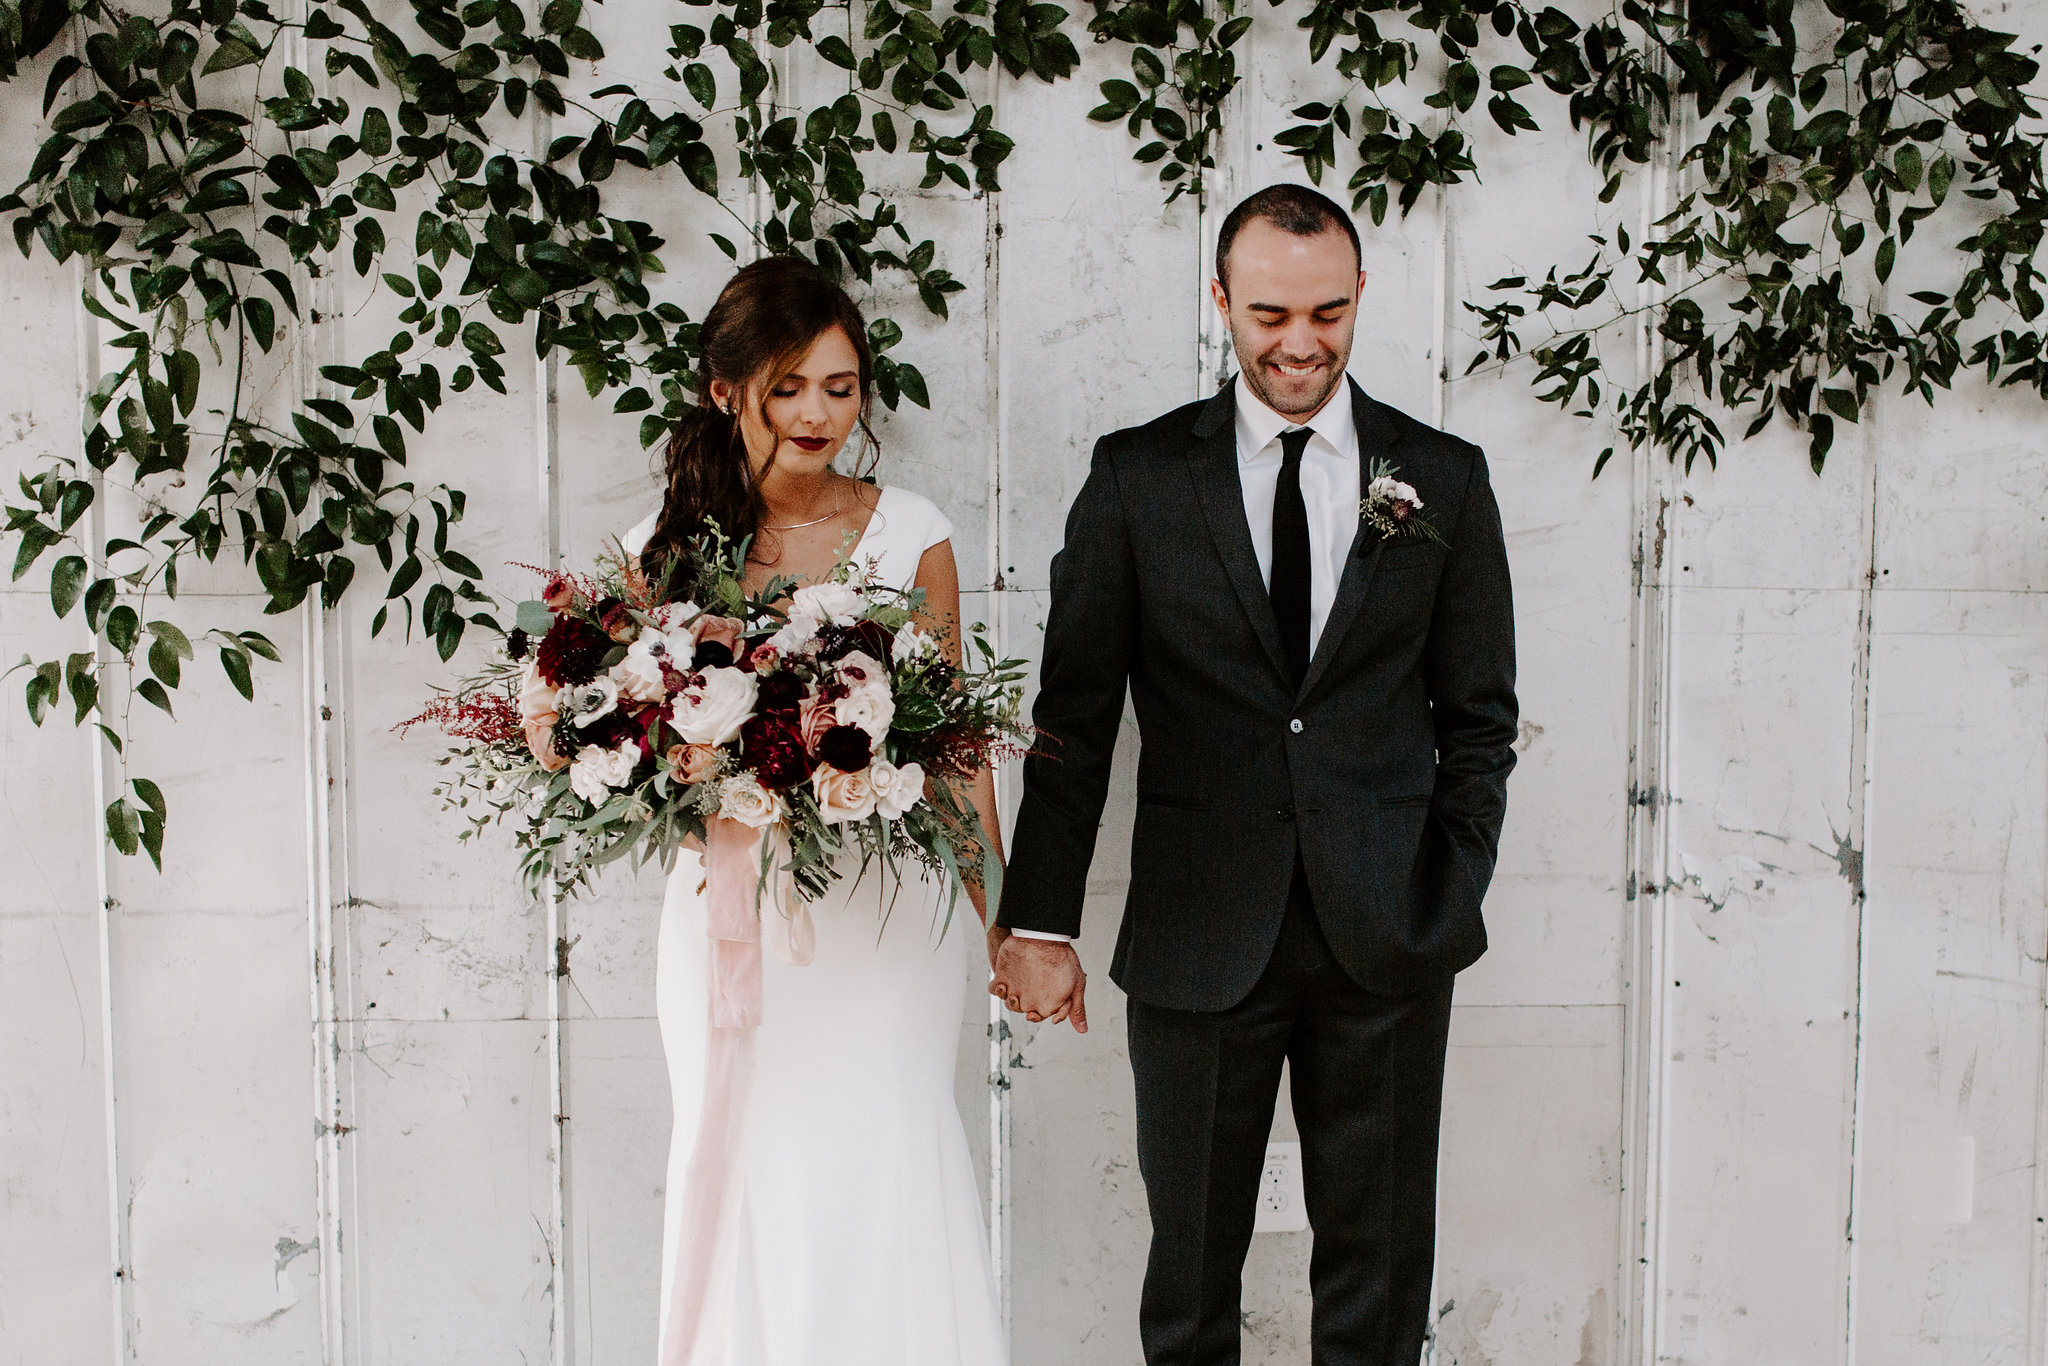 Minimalist Industrial Wedding A Griffin Events Mikayla Herrick DC532.jpg